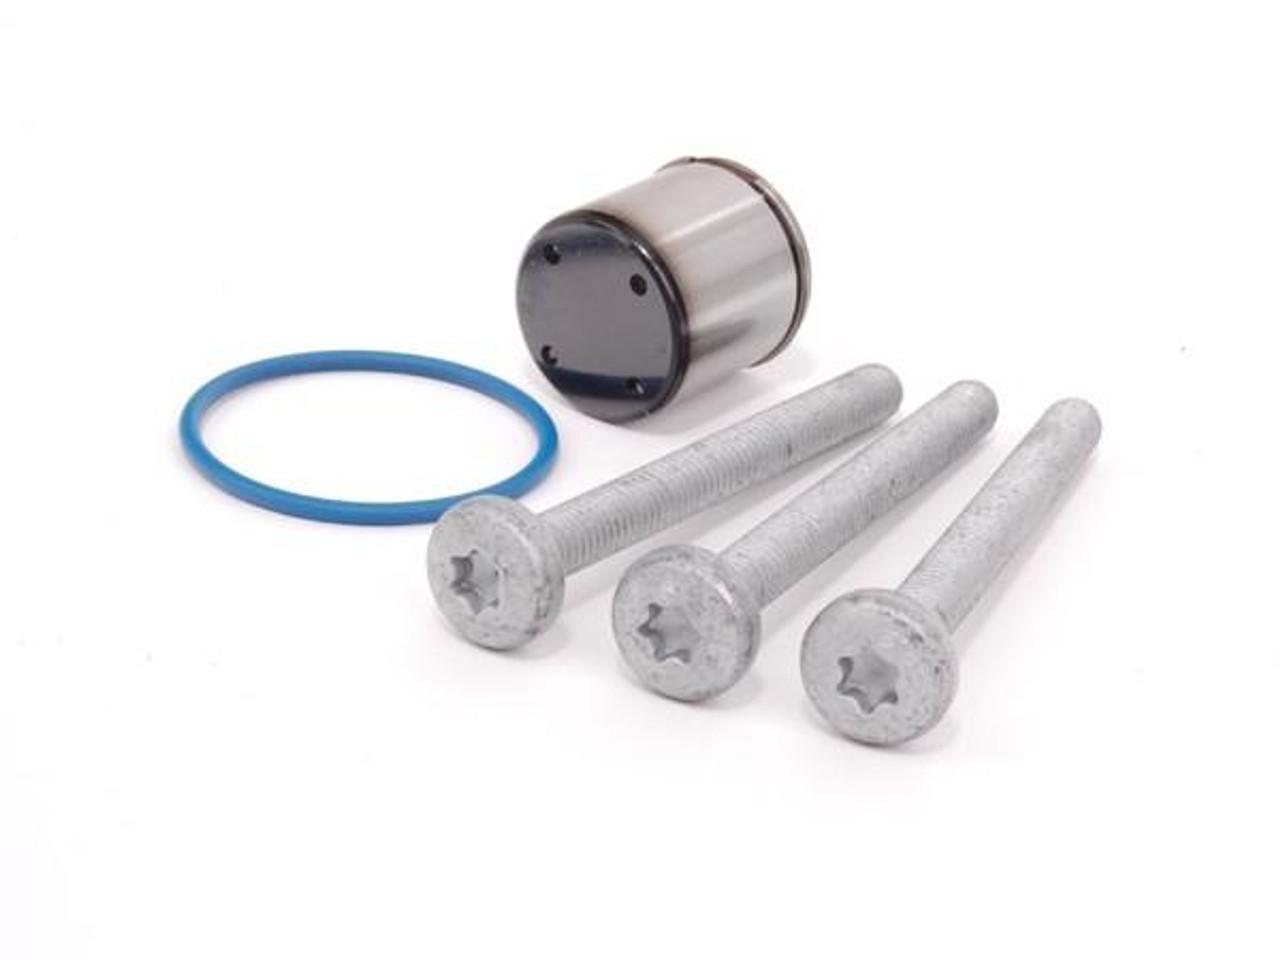 2 0TFSI (EA113) Fuel Pump Cam Follower Replacement Kit